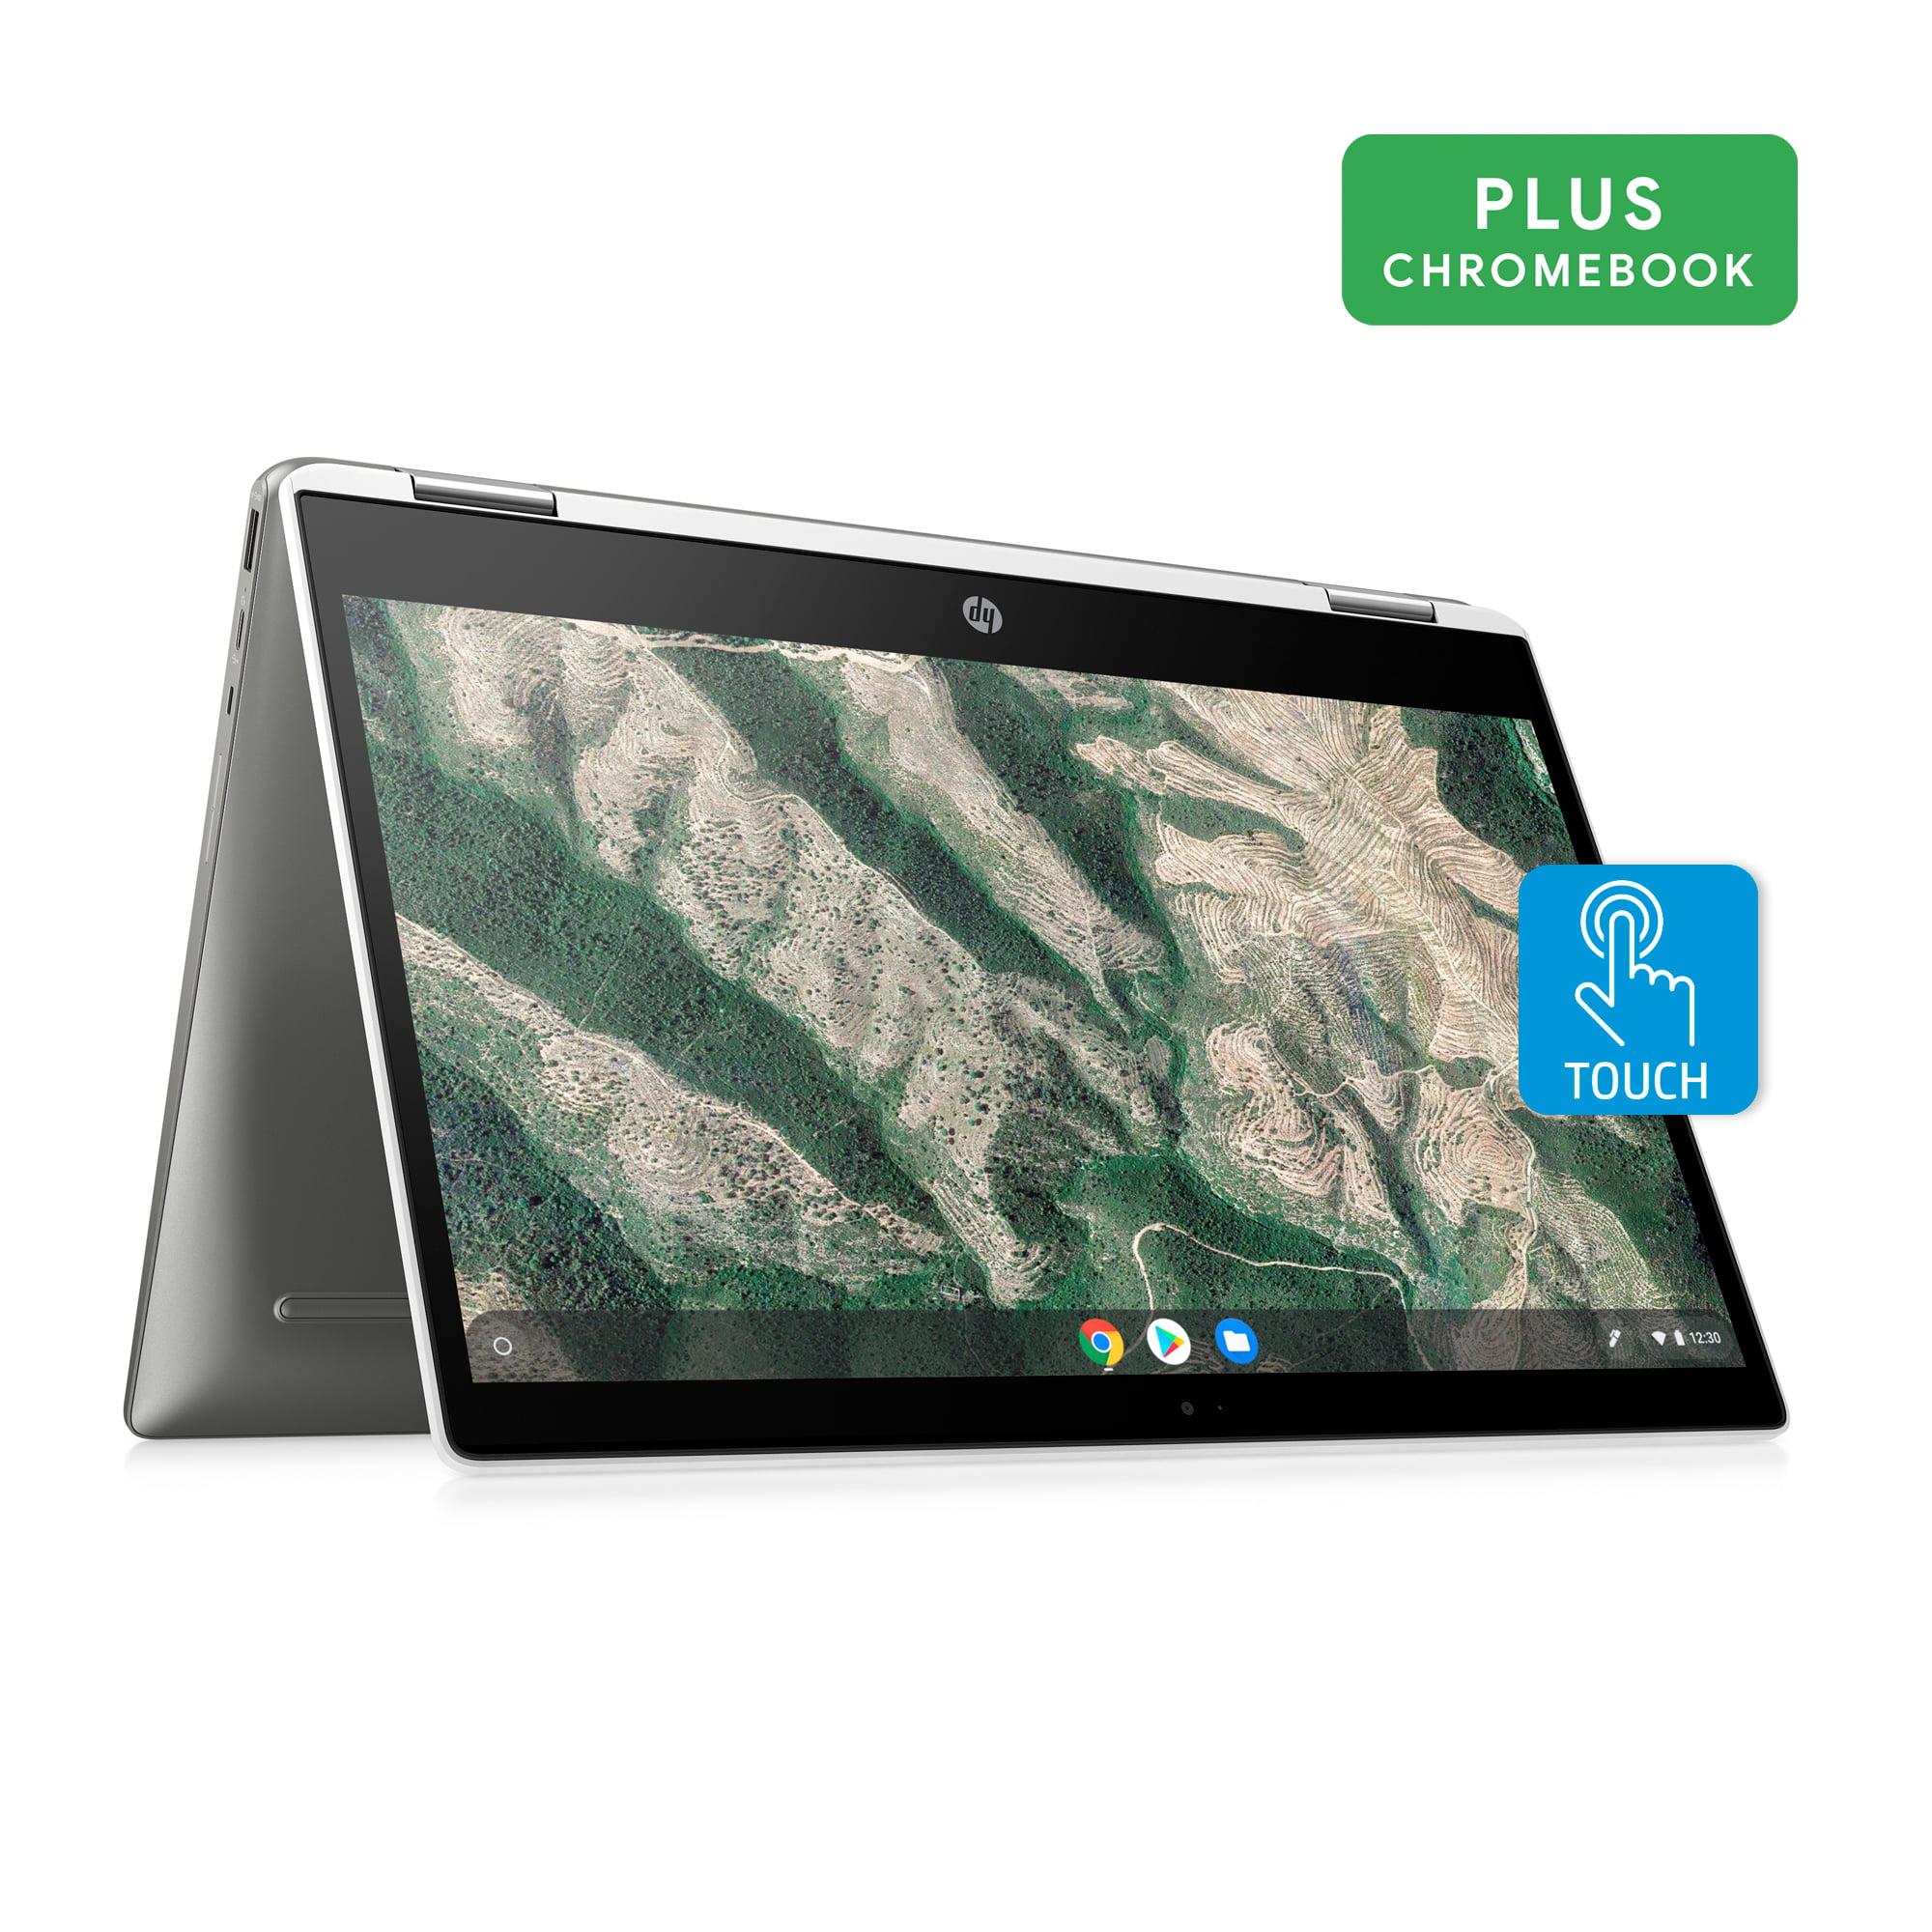 "HP X360 14"" Pentium Touch 4GB/128GB Chromebook, 14"" HD Touch Display, Intel Pentium Silver N5000, 4GB RAM, 128GB eMMC, Intel UHD Graphics 600, 14b-ca0061wm"